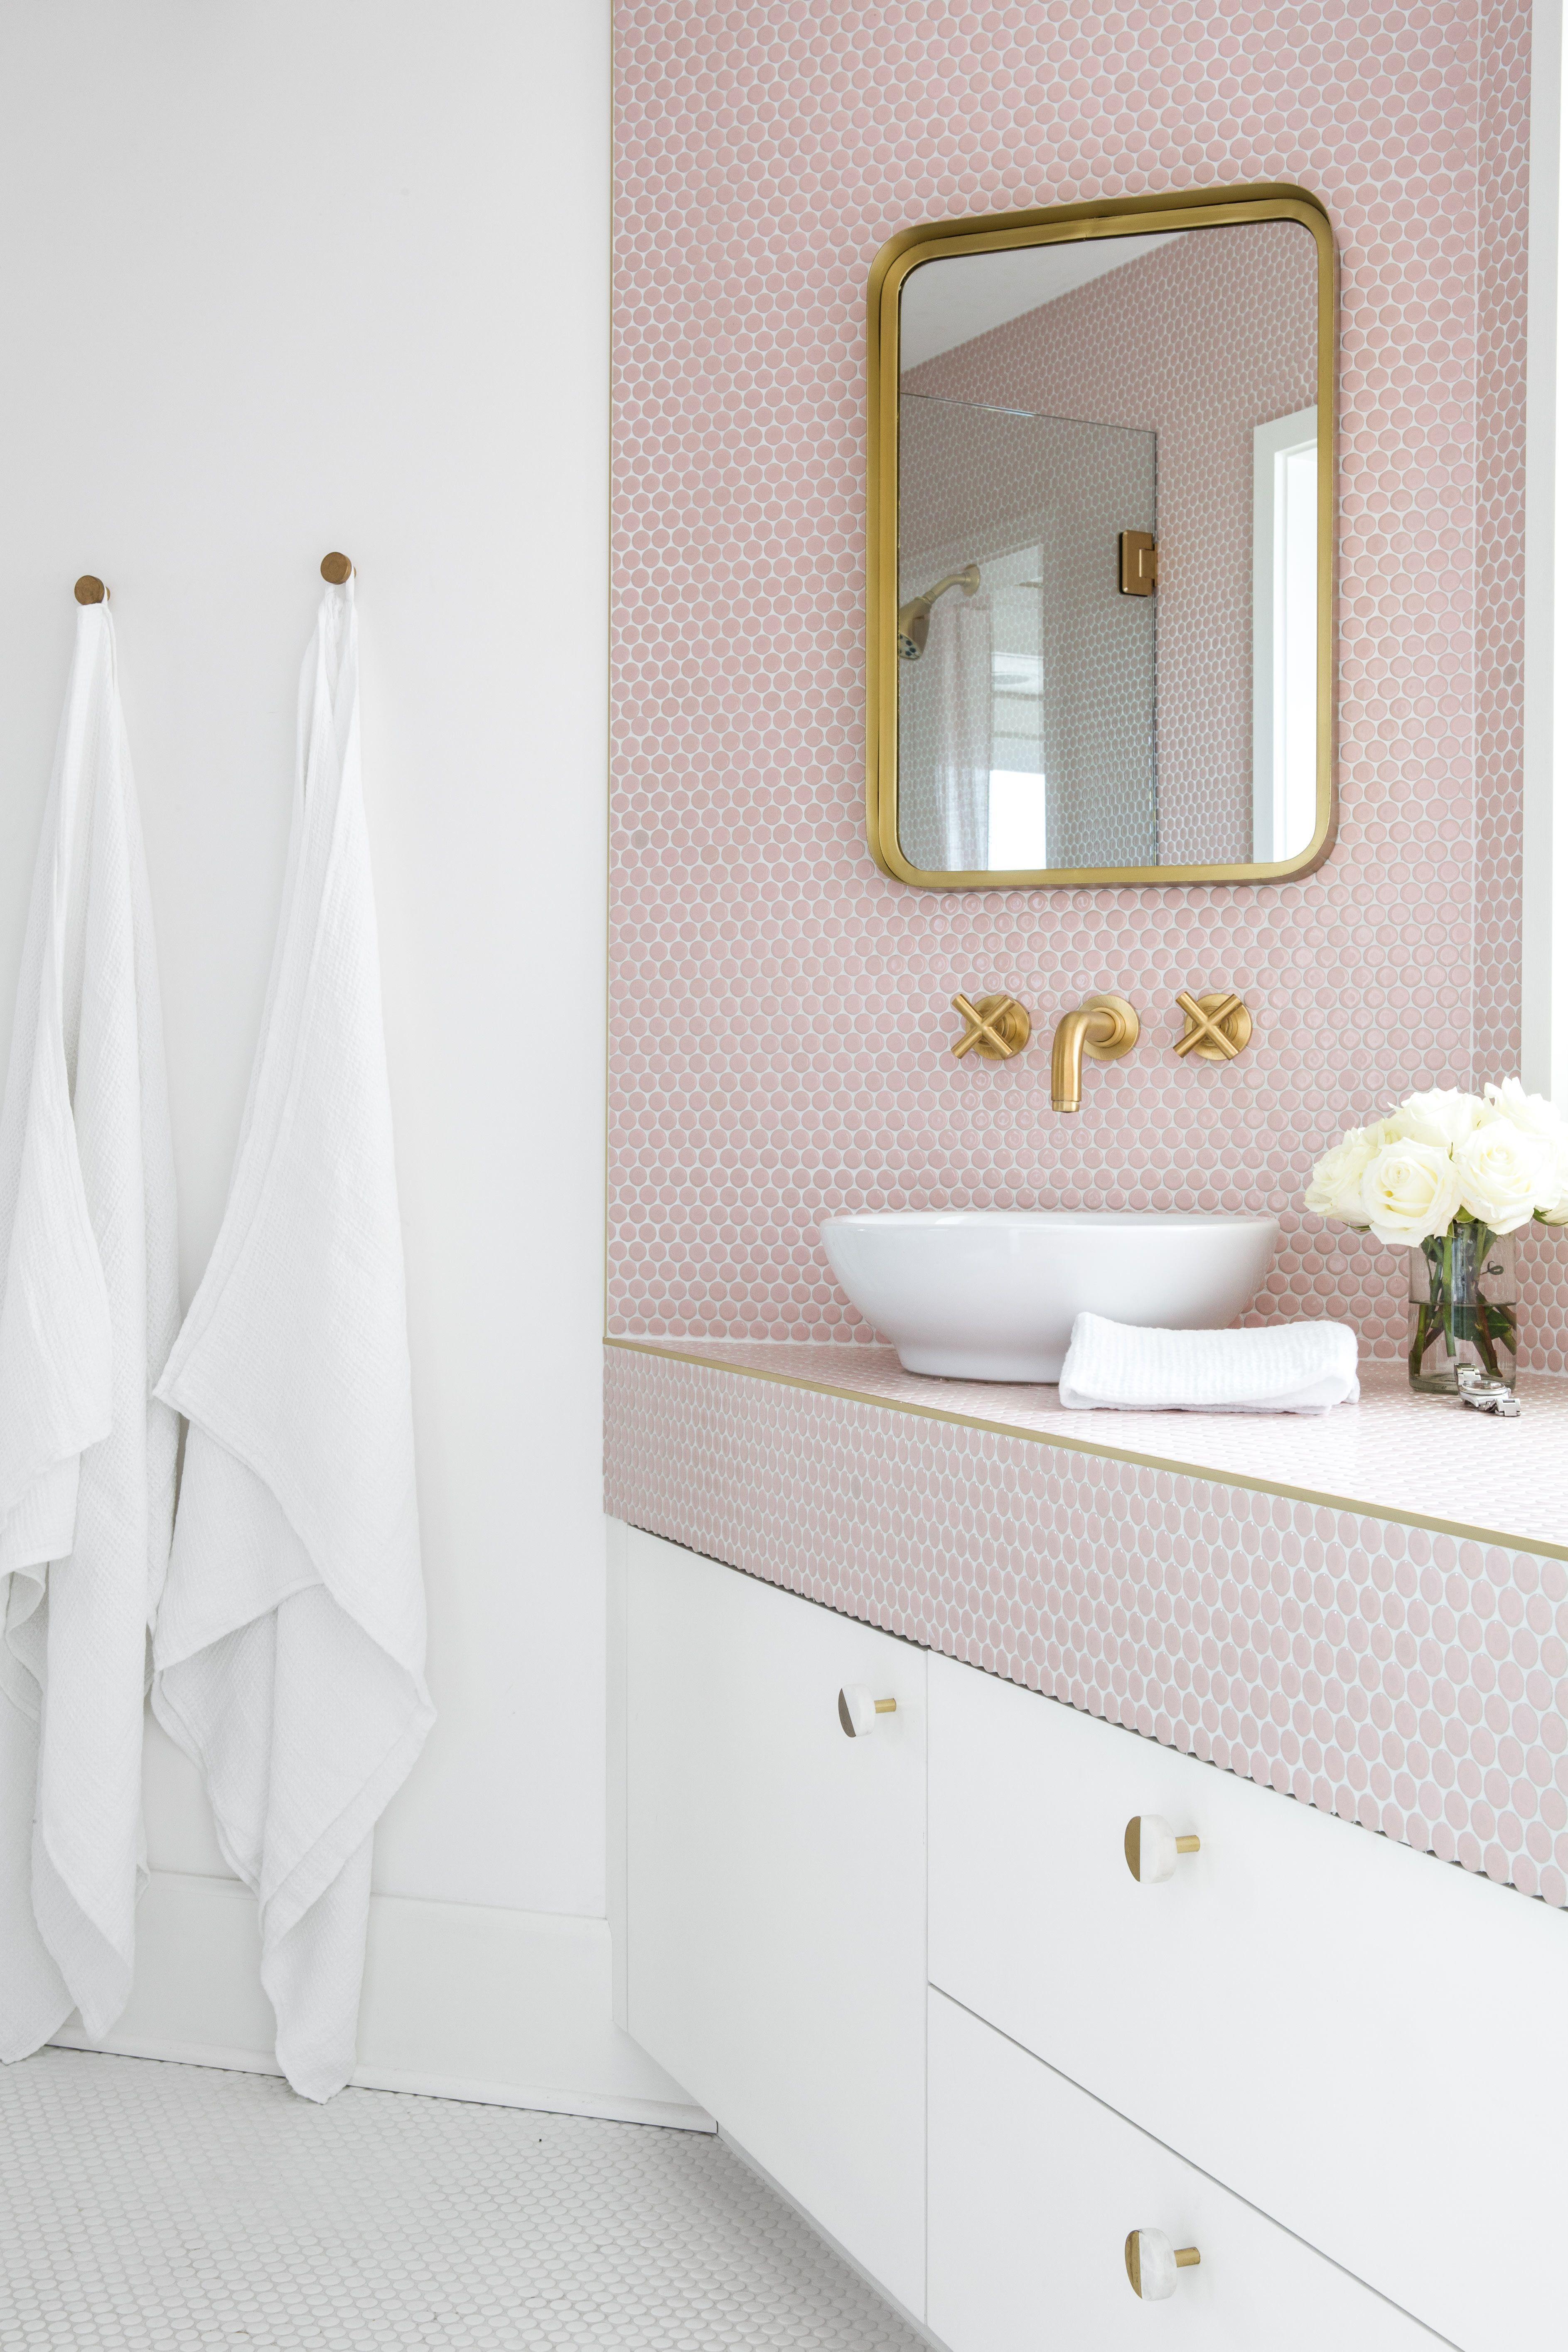 31 Bathroom Tile Ideas Make It Fresh And Not Boring Penny Tiles Bathroom Trending Decor Bathroom Interior